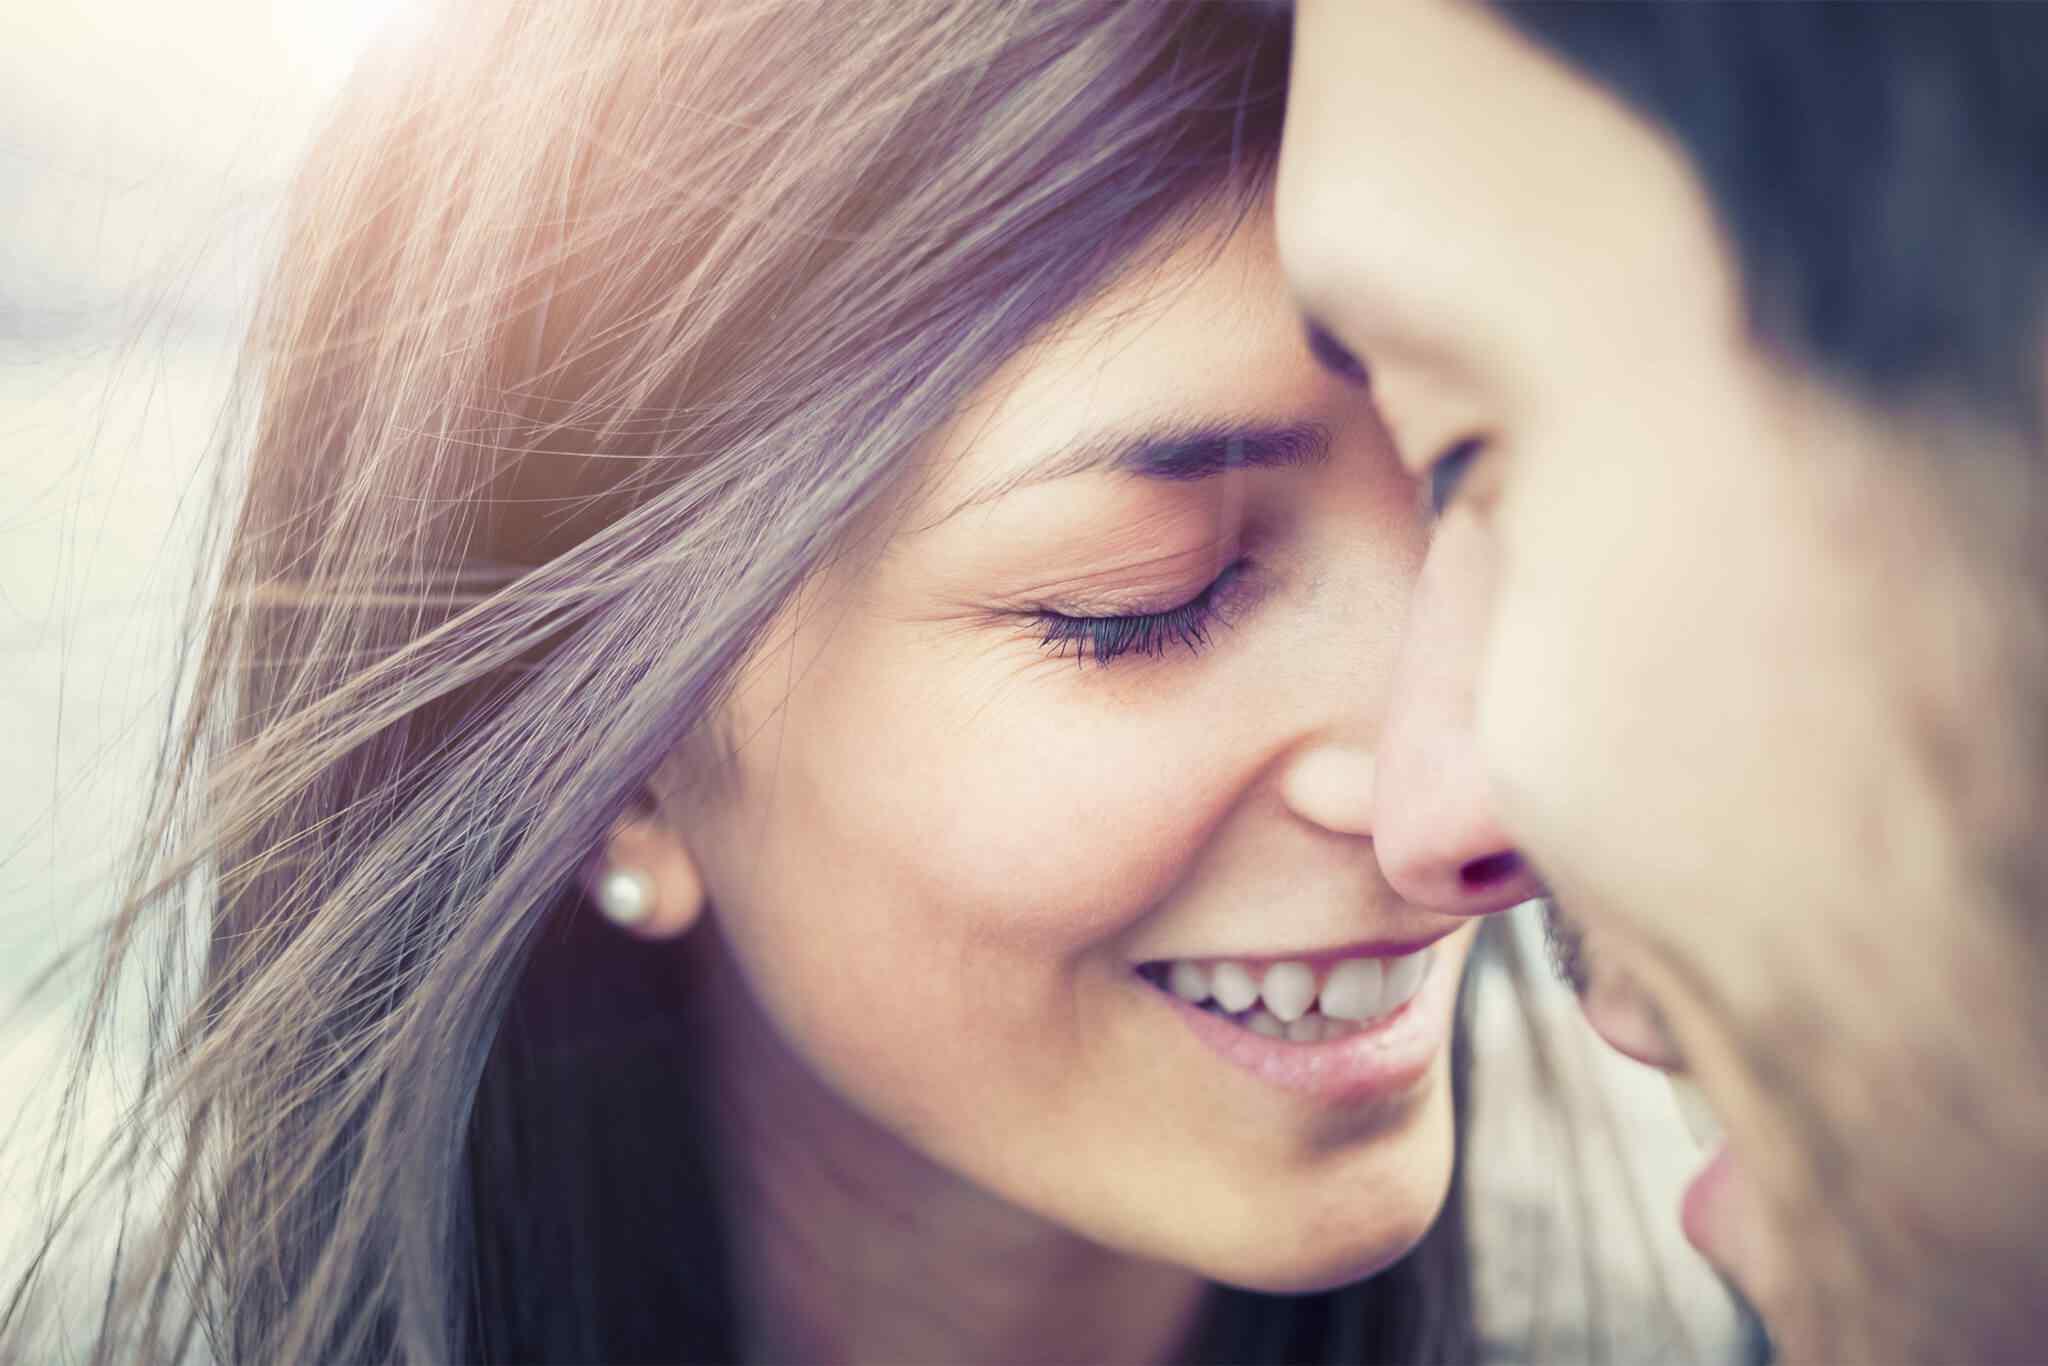 https://ademvrouw.nl/wp-content/uploads/2018/01/img-class-marriage-01.jpg